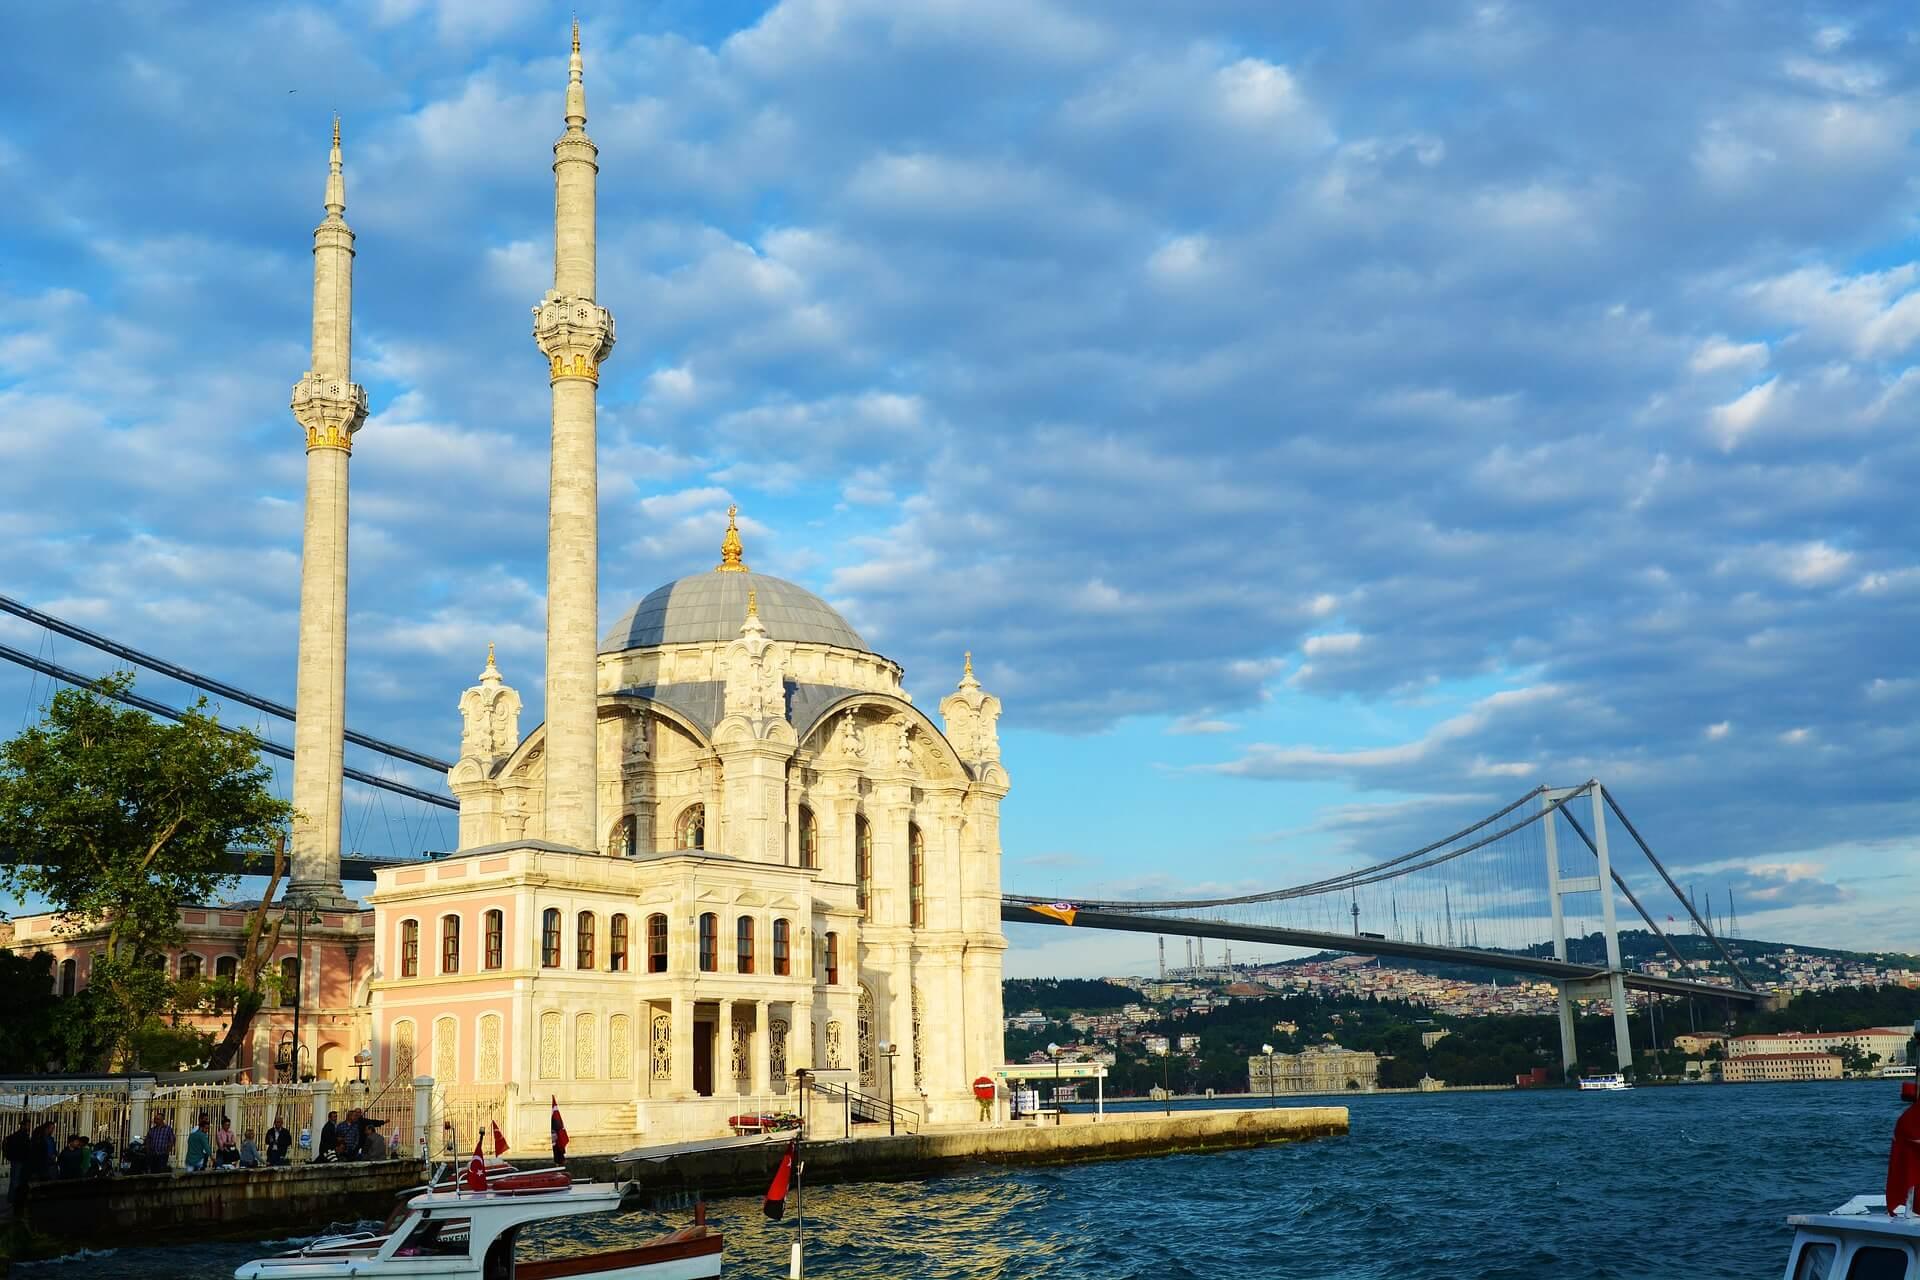 Direktflüge ab Berlin-Schönefeld nach Istanbul Sabiha